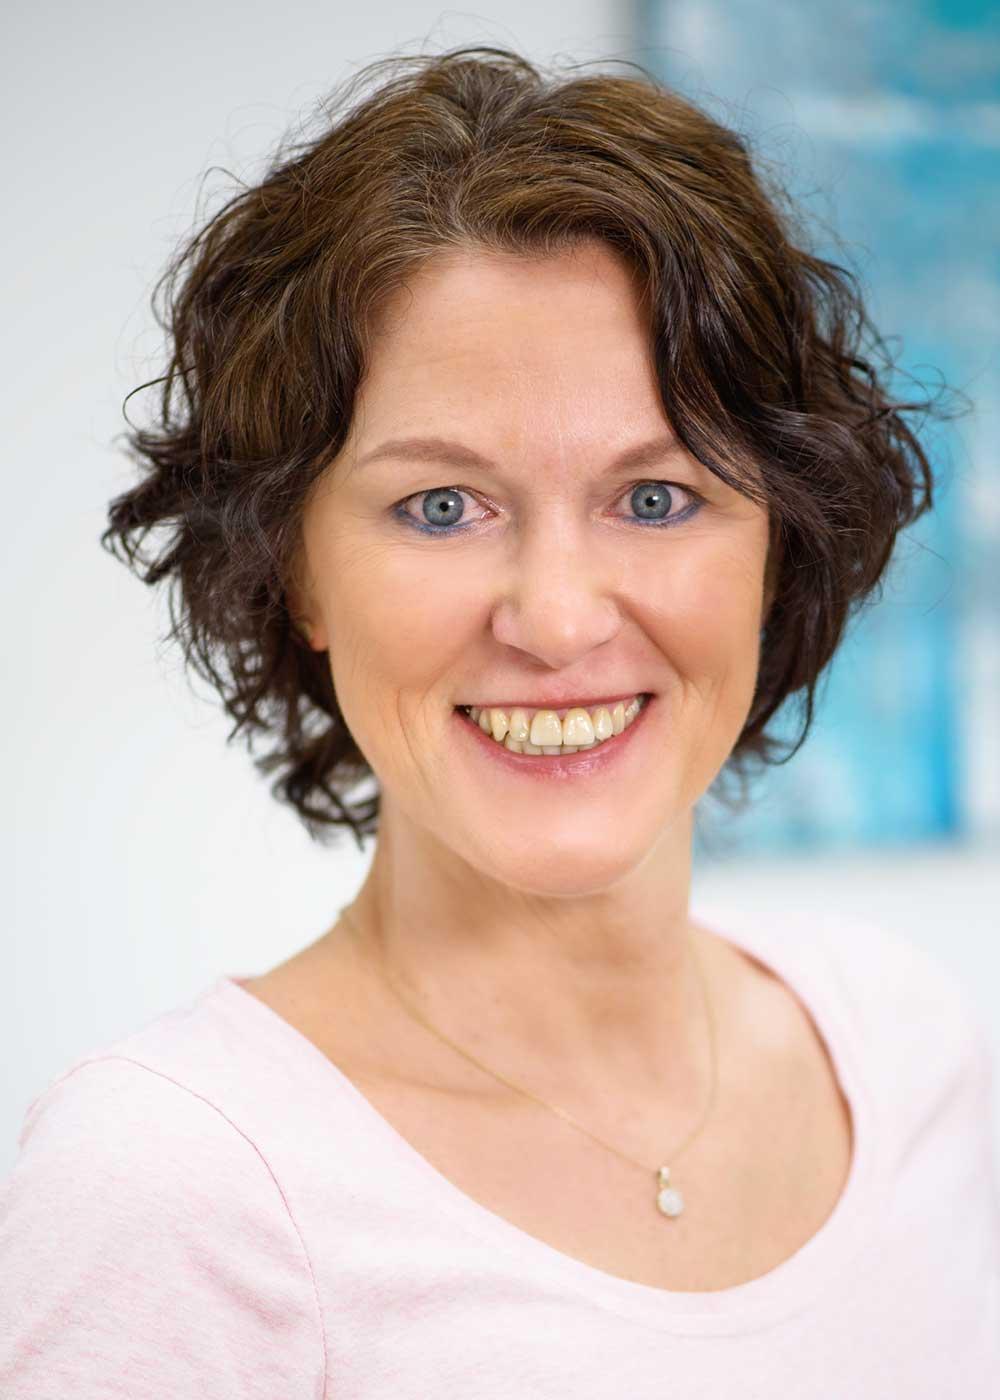 Anke Pfeifer-Clemens